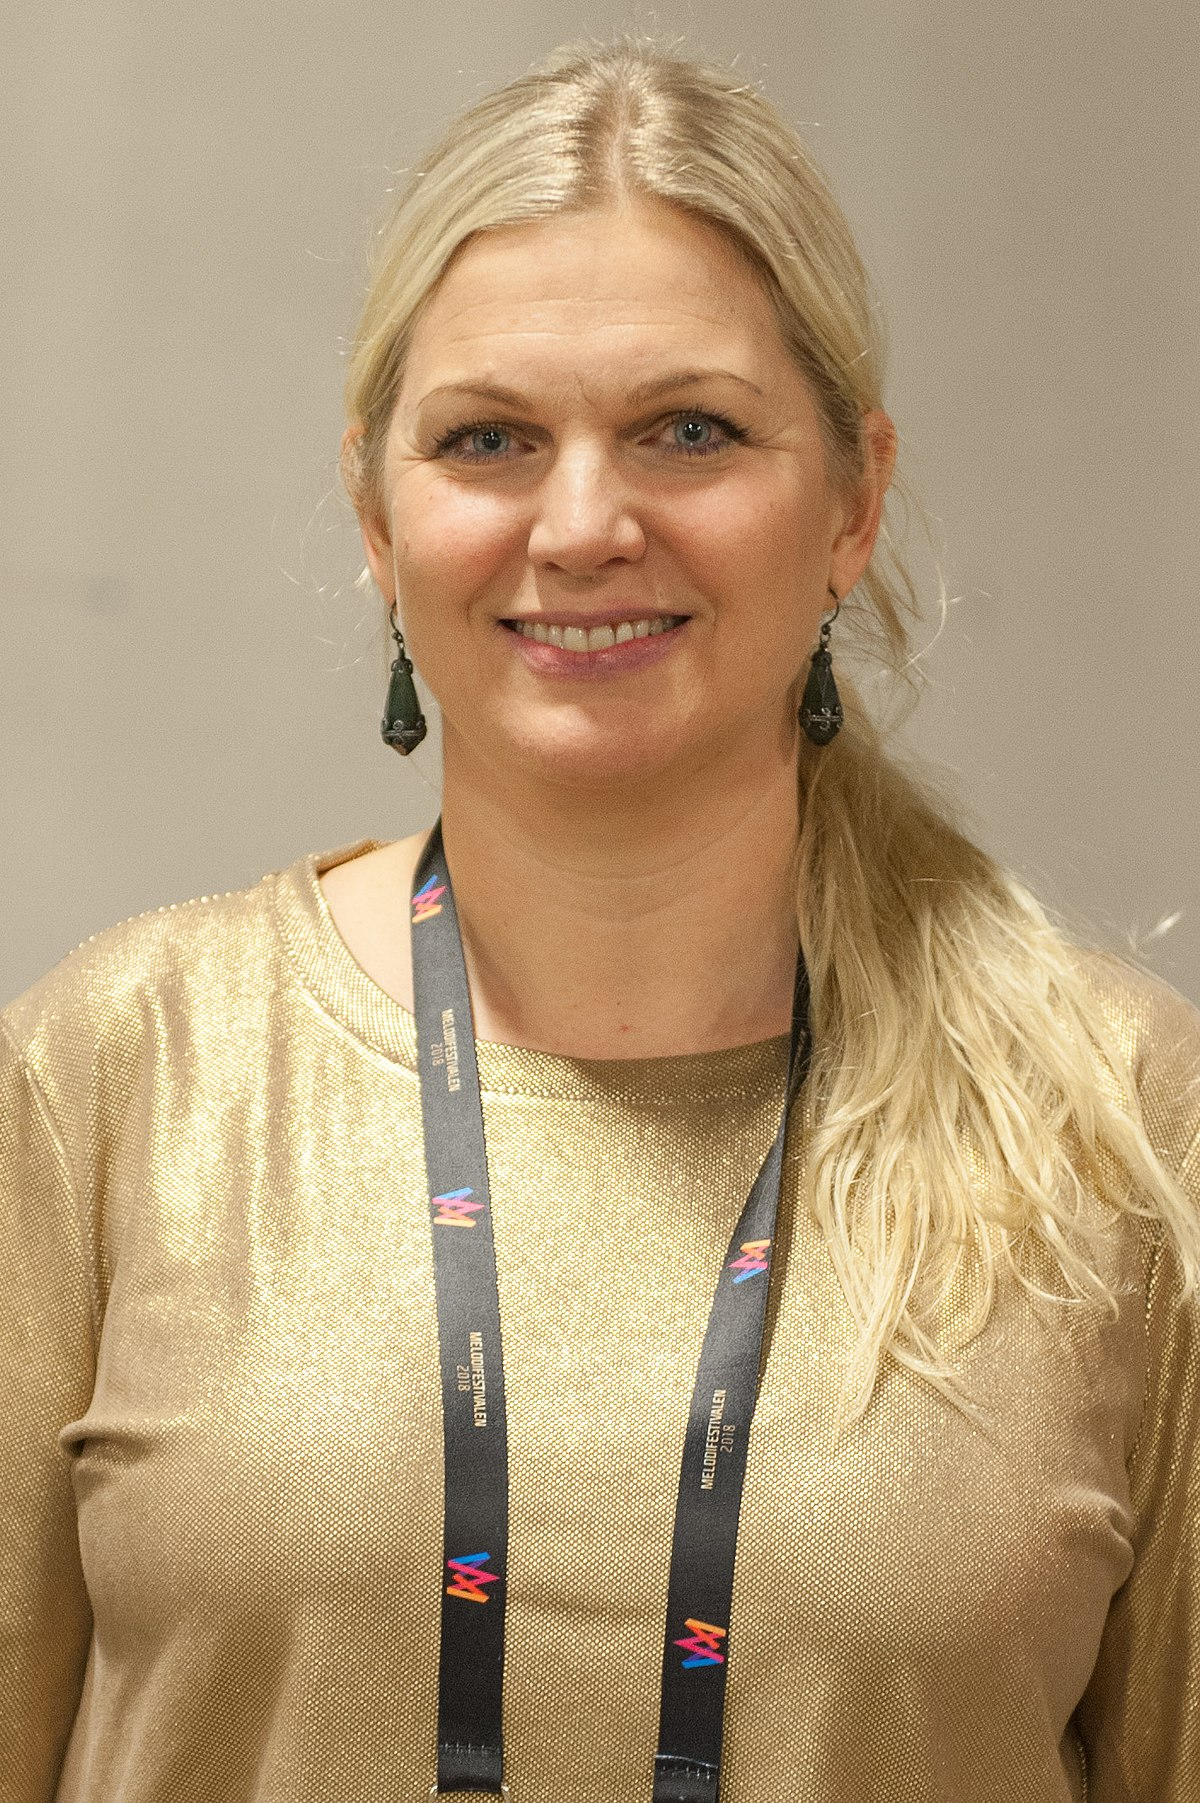 Josefin Glenmark Wikipedia